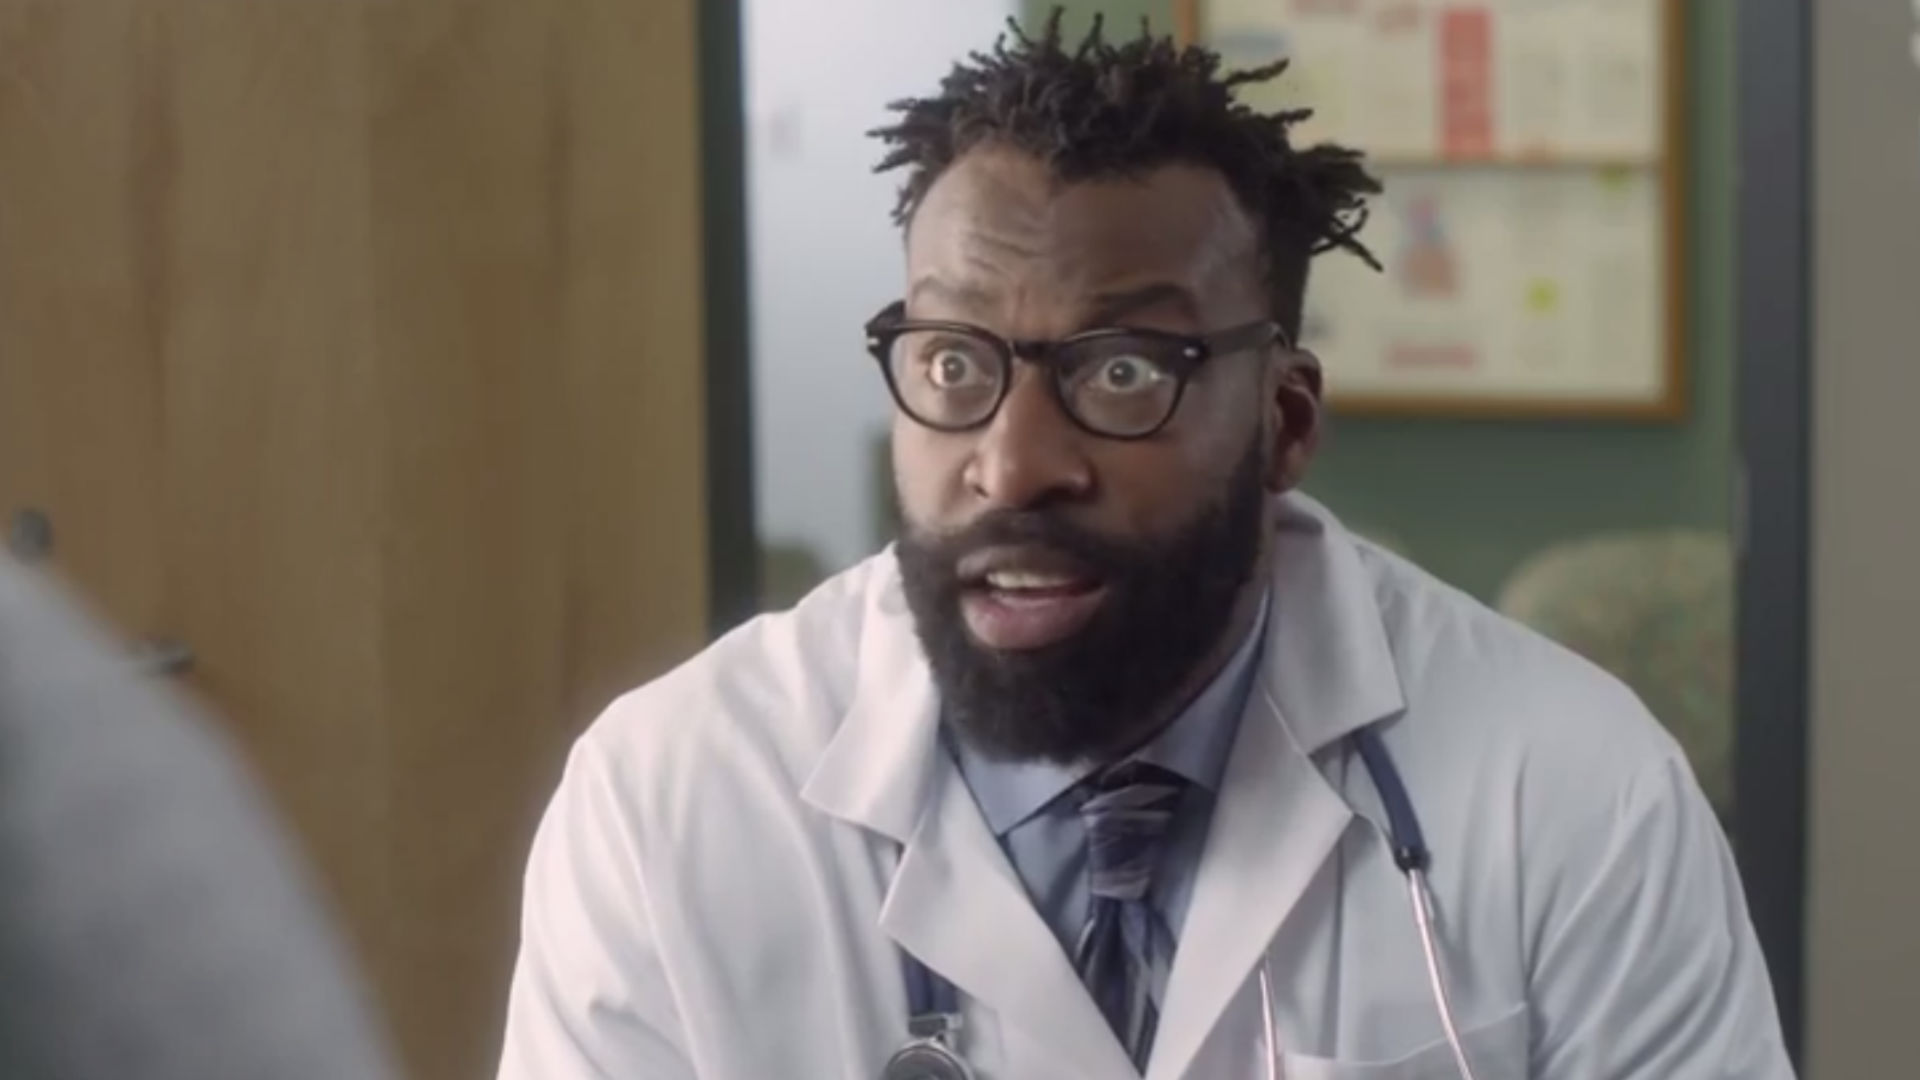 Former NBA guard Baron Davis makes cameo in Joe Dirt 2 trailer